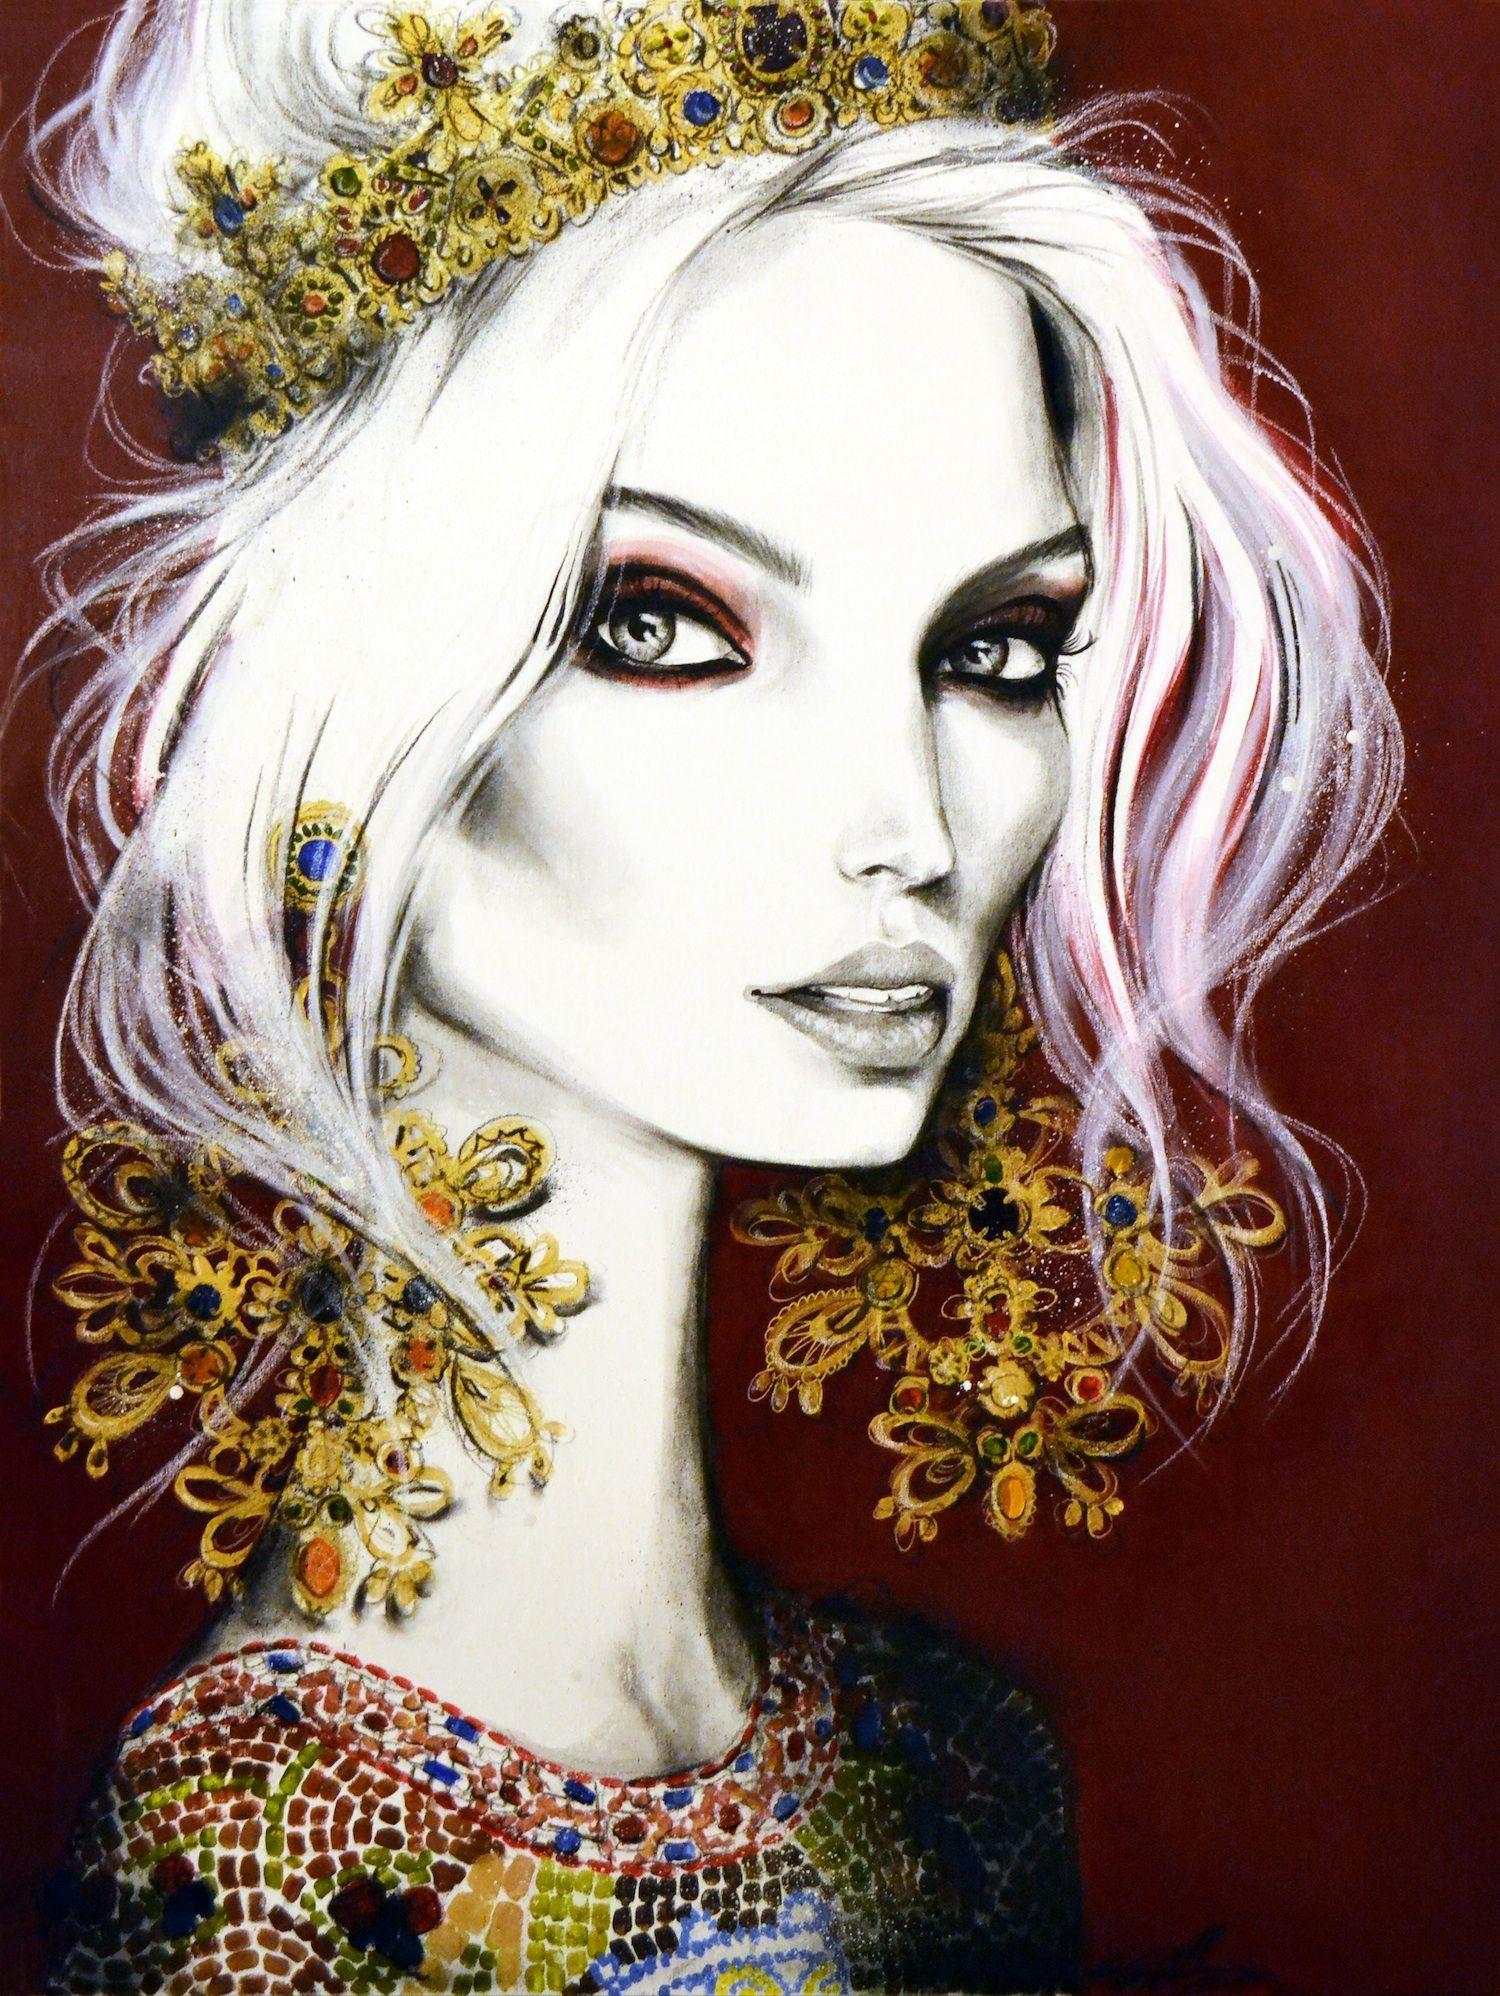 Illustration.Files: Dolce & Gabbana F/W 2013 Fashion Illustration by Pippa McManus